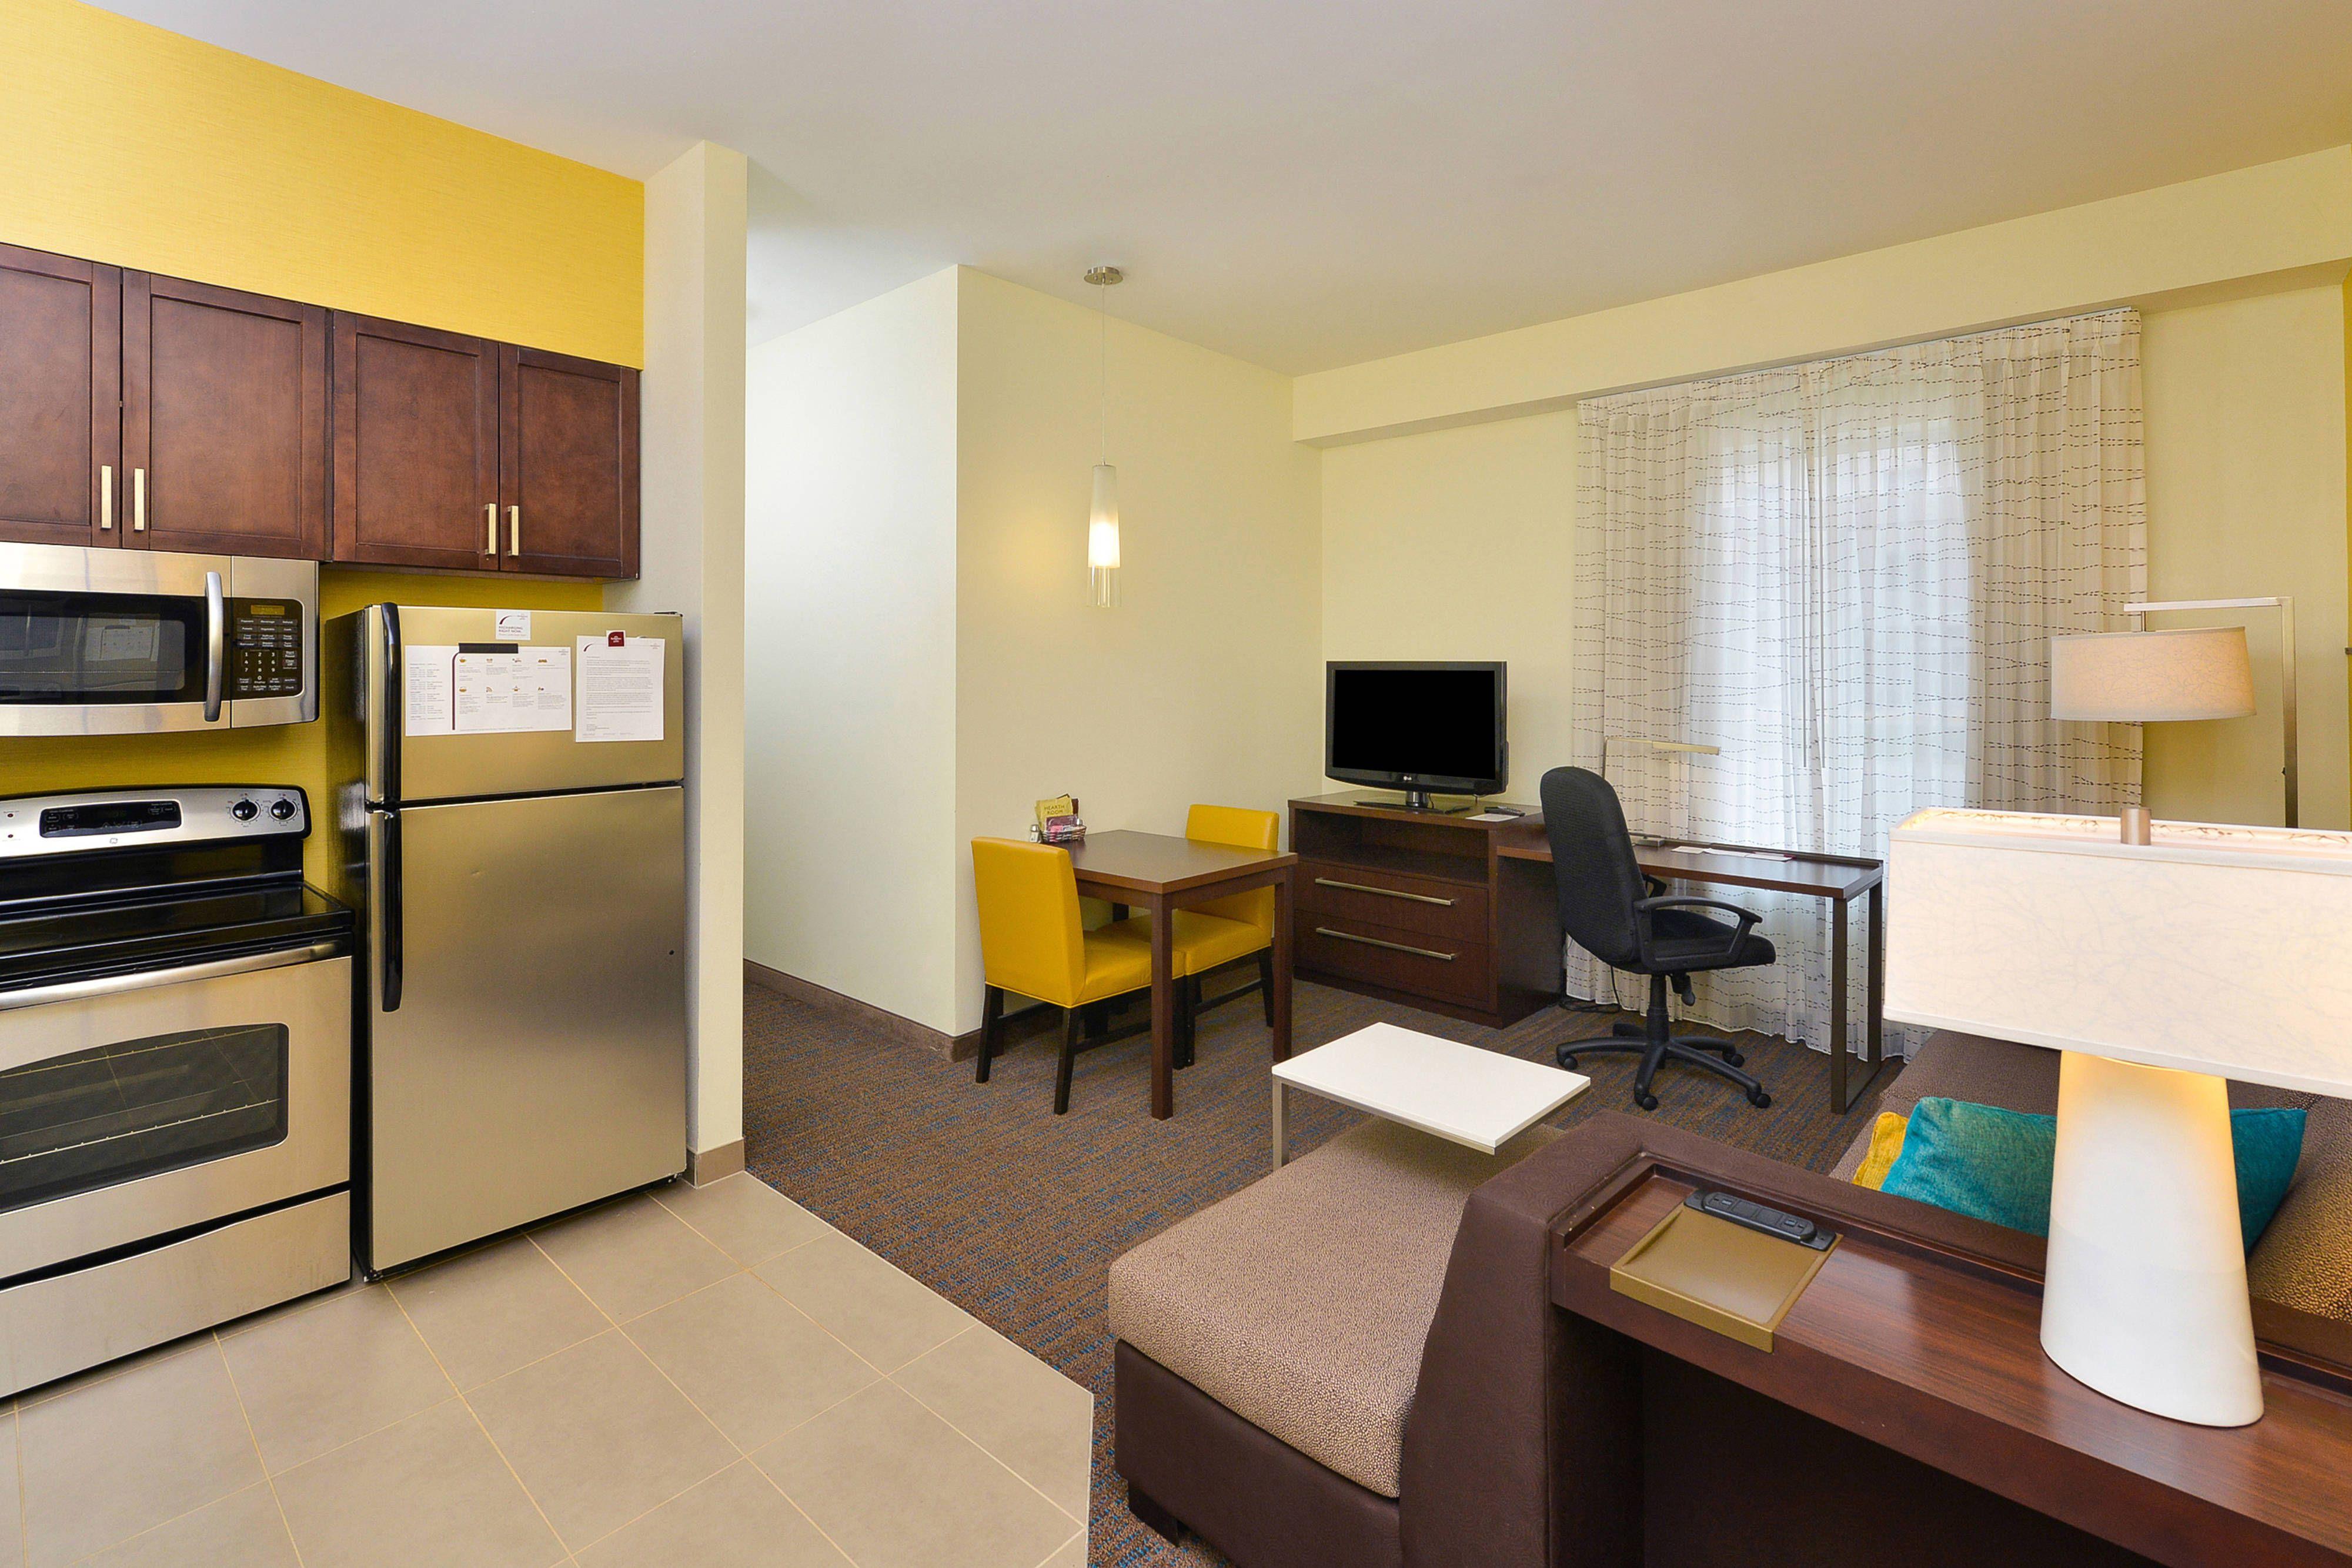 1 Bedroom Apartment San Jose Pet Friendly